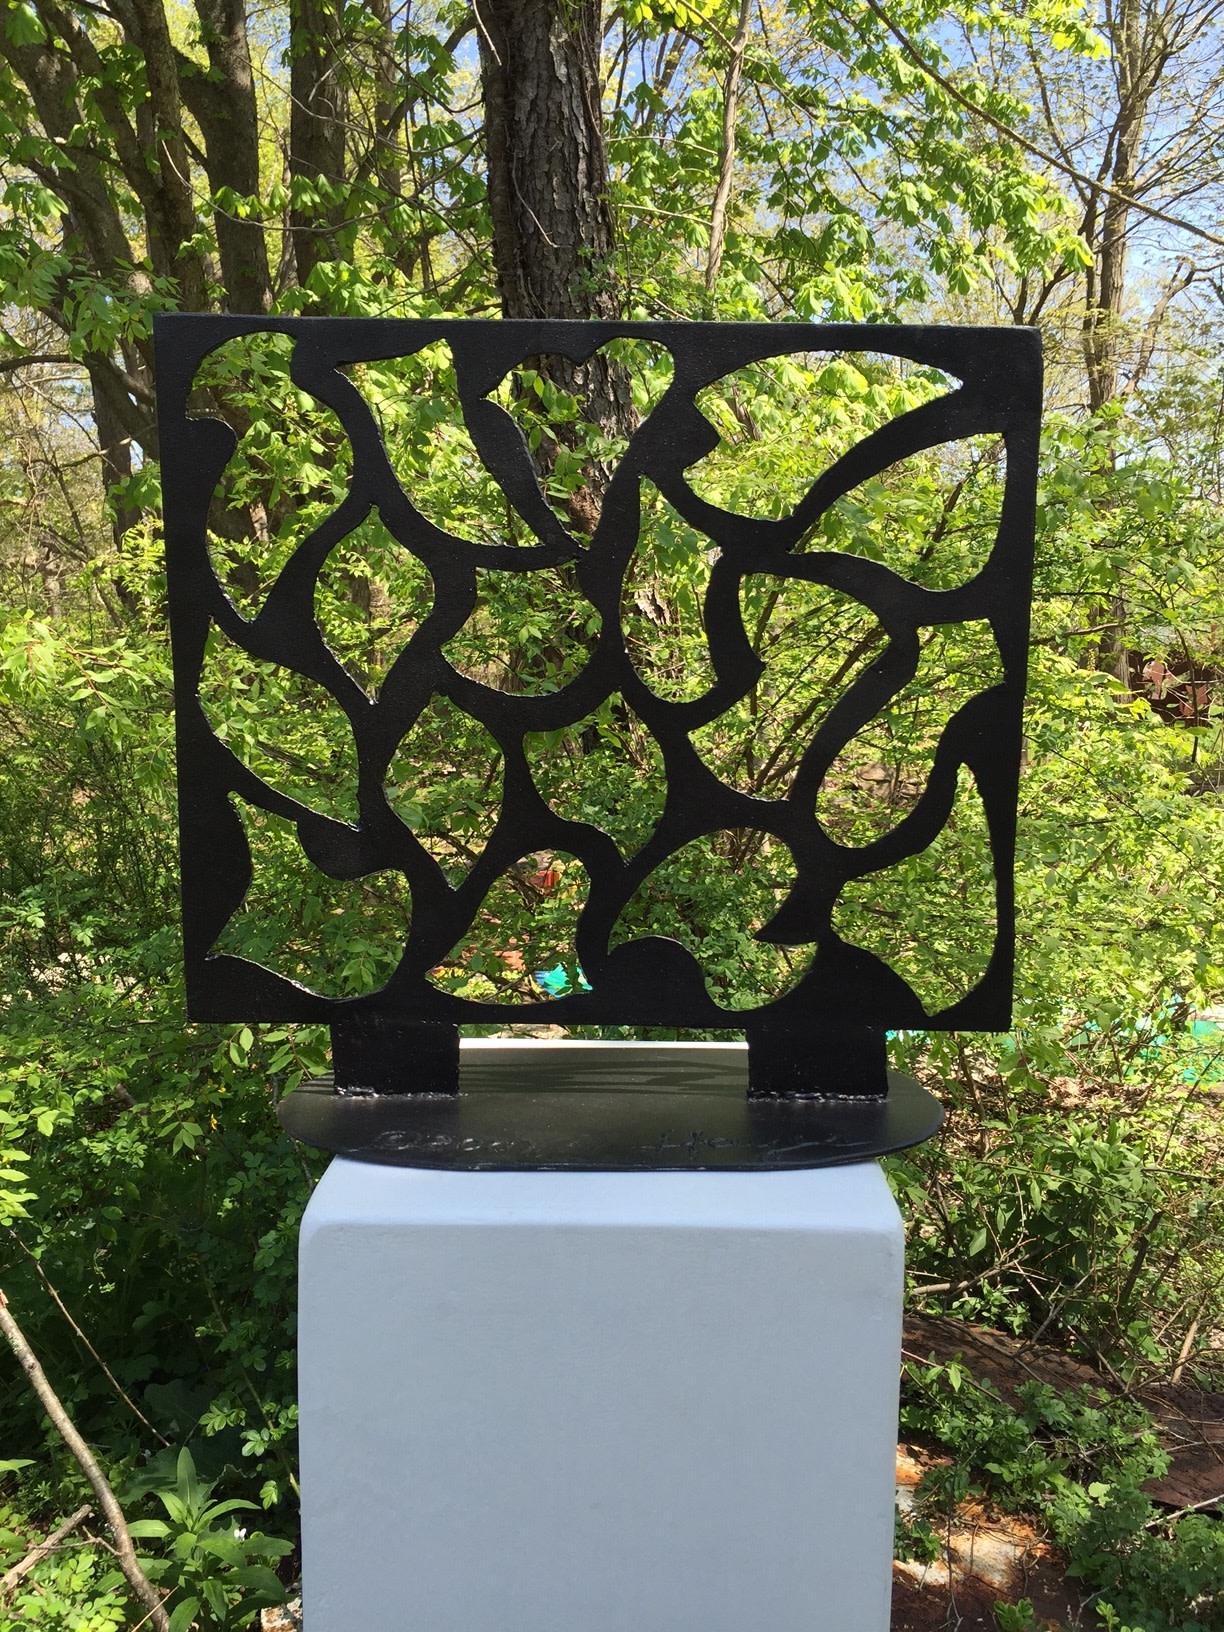 "<span class=""link fancybox-details-link""><a href=""/exhibitions/37/works/artworks542/"">View Detail Page</a></span><div class=""artist""><strong>David Hayes</strong></div><div class=""title""><em>Landscape Sculpture</em>, 2007</div><div class=""medium"">Painted, welded steel</div><div class=""dimensions"">61 x 55.9 x 26 cm<br>24 x 22 x 10 1/4 in.</div>"